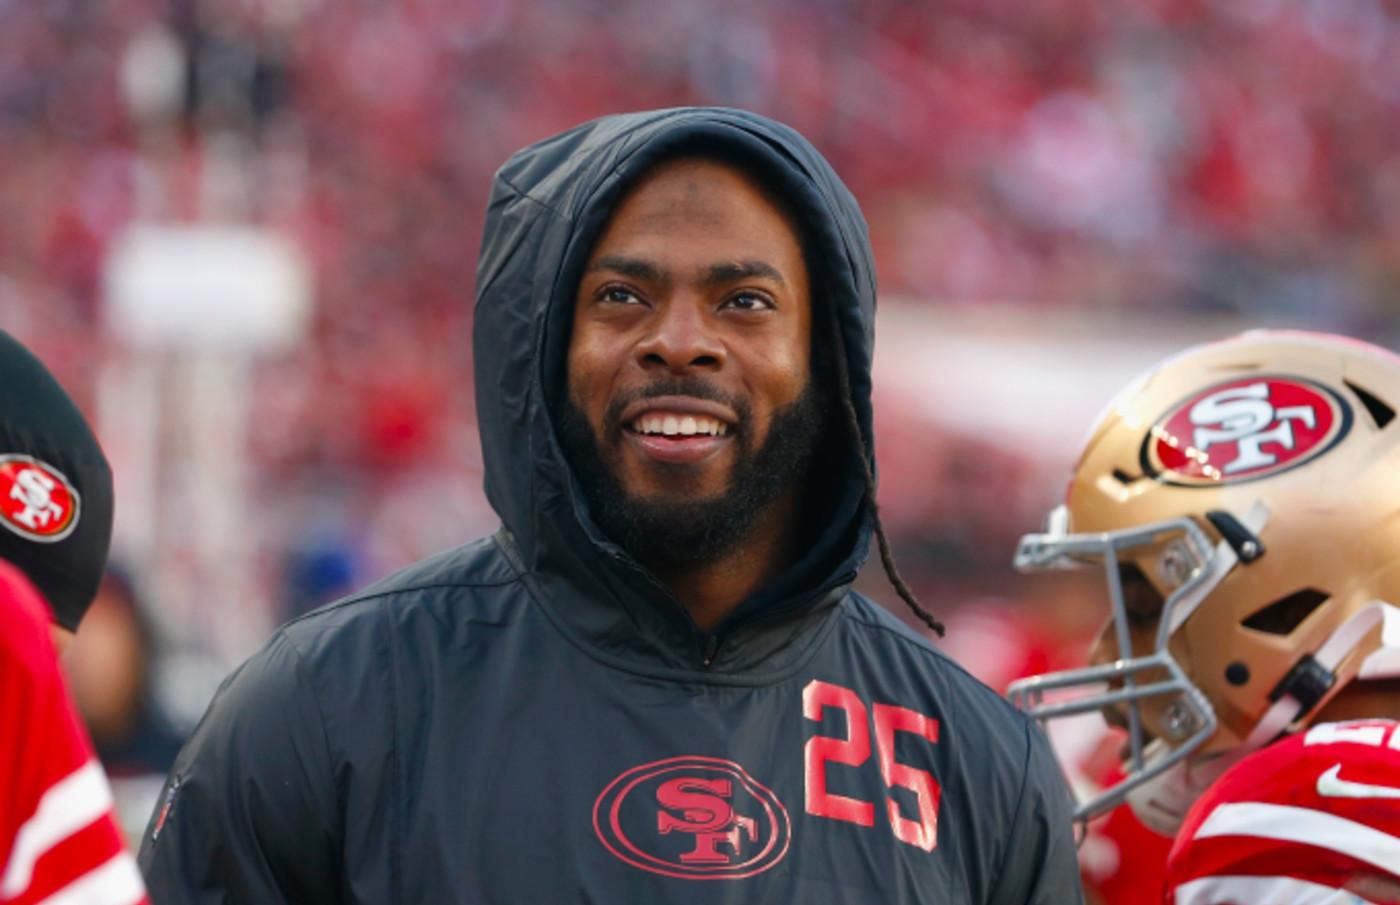 Richard Sherman #25 of the San Francisco 49ers